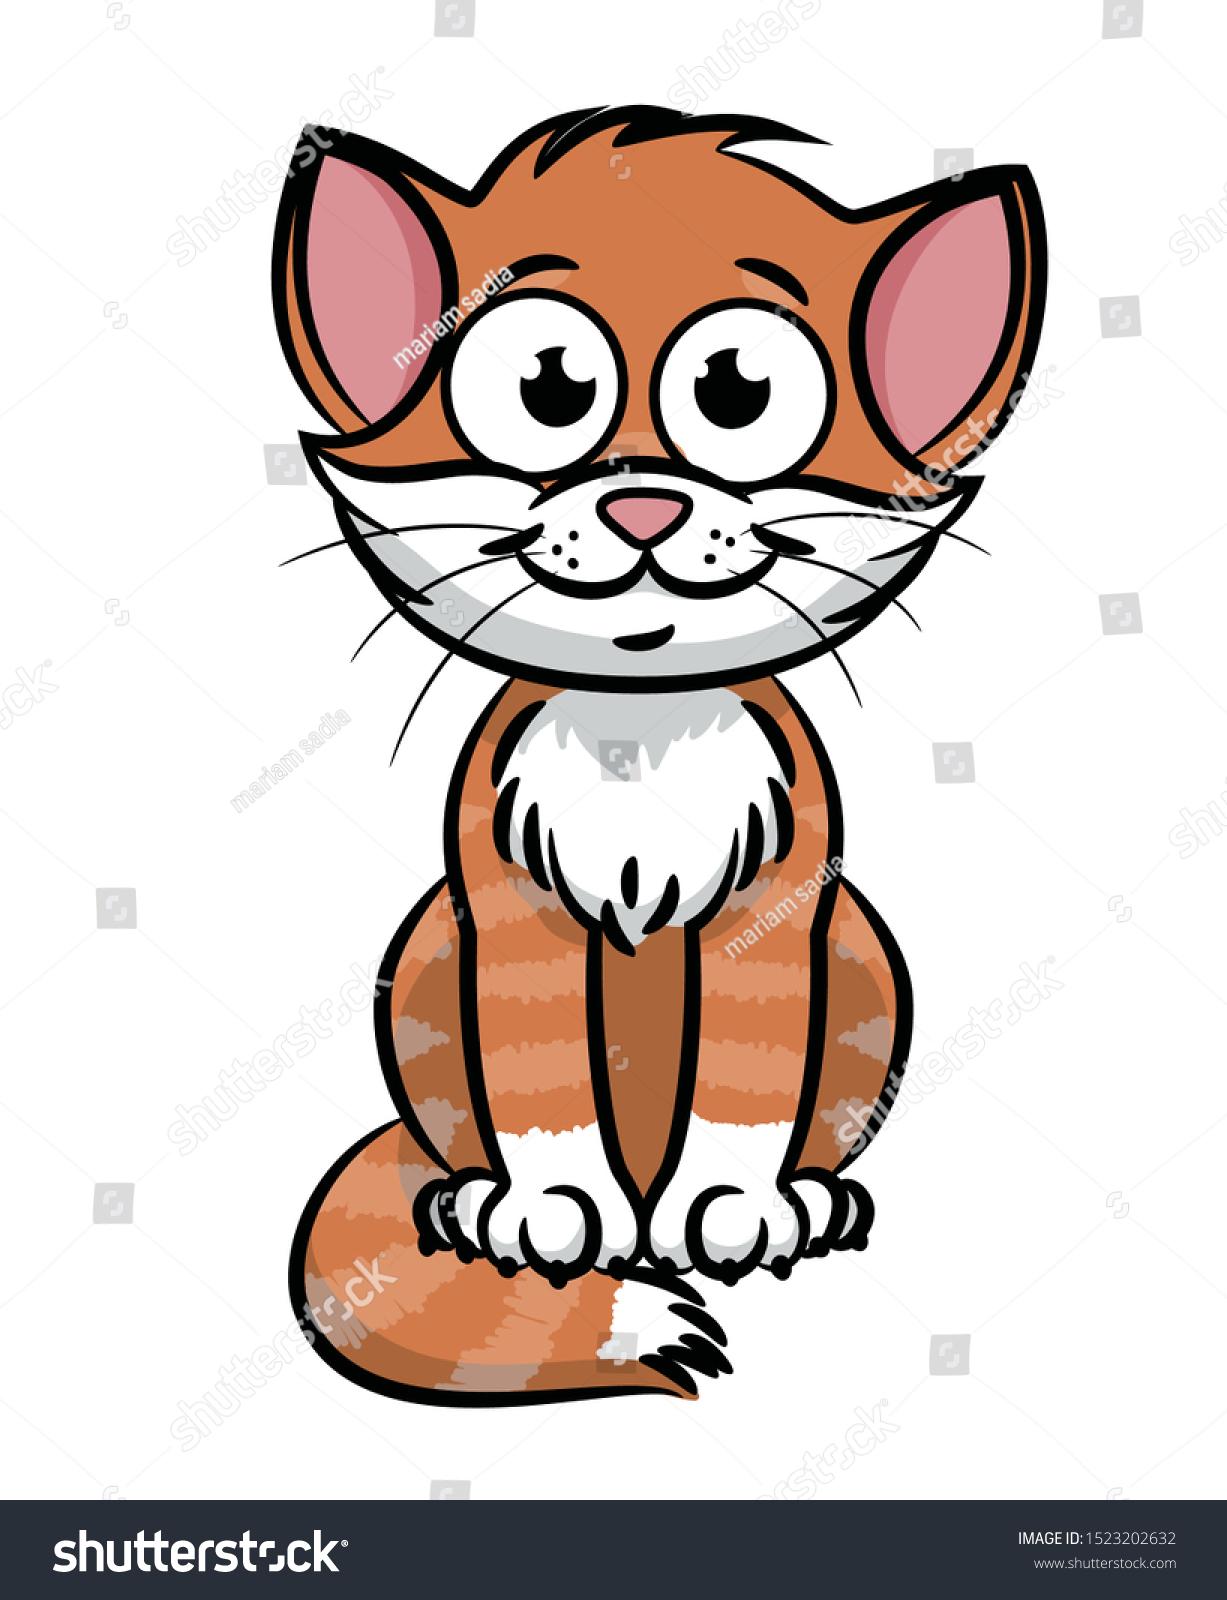 Kitty Cute Cat Cartoon Vector Illustration Stock Vector Royalty Free 1523202632